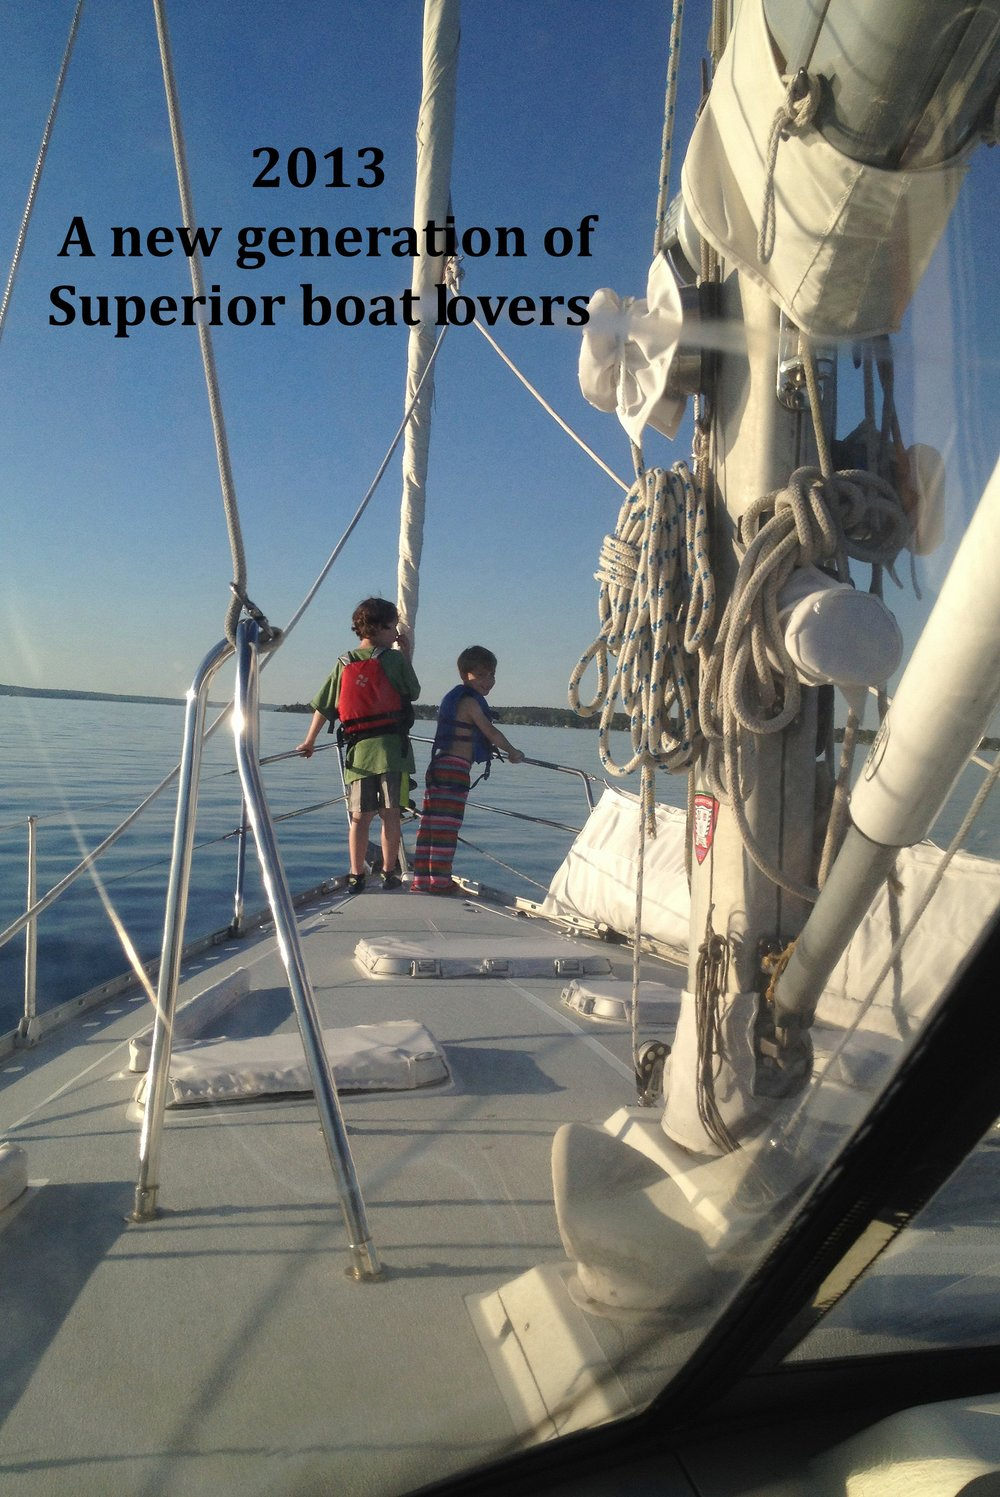 2013 Next generation of Superior boat lovers.JPG